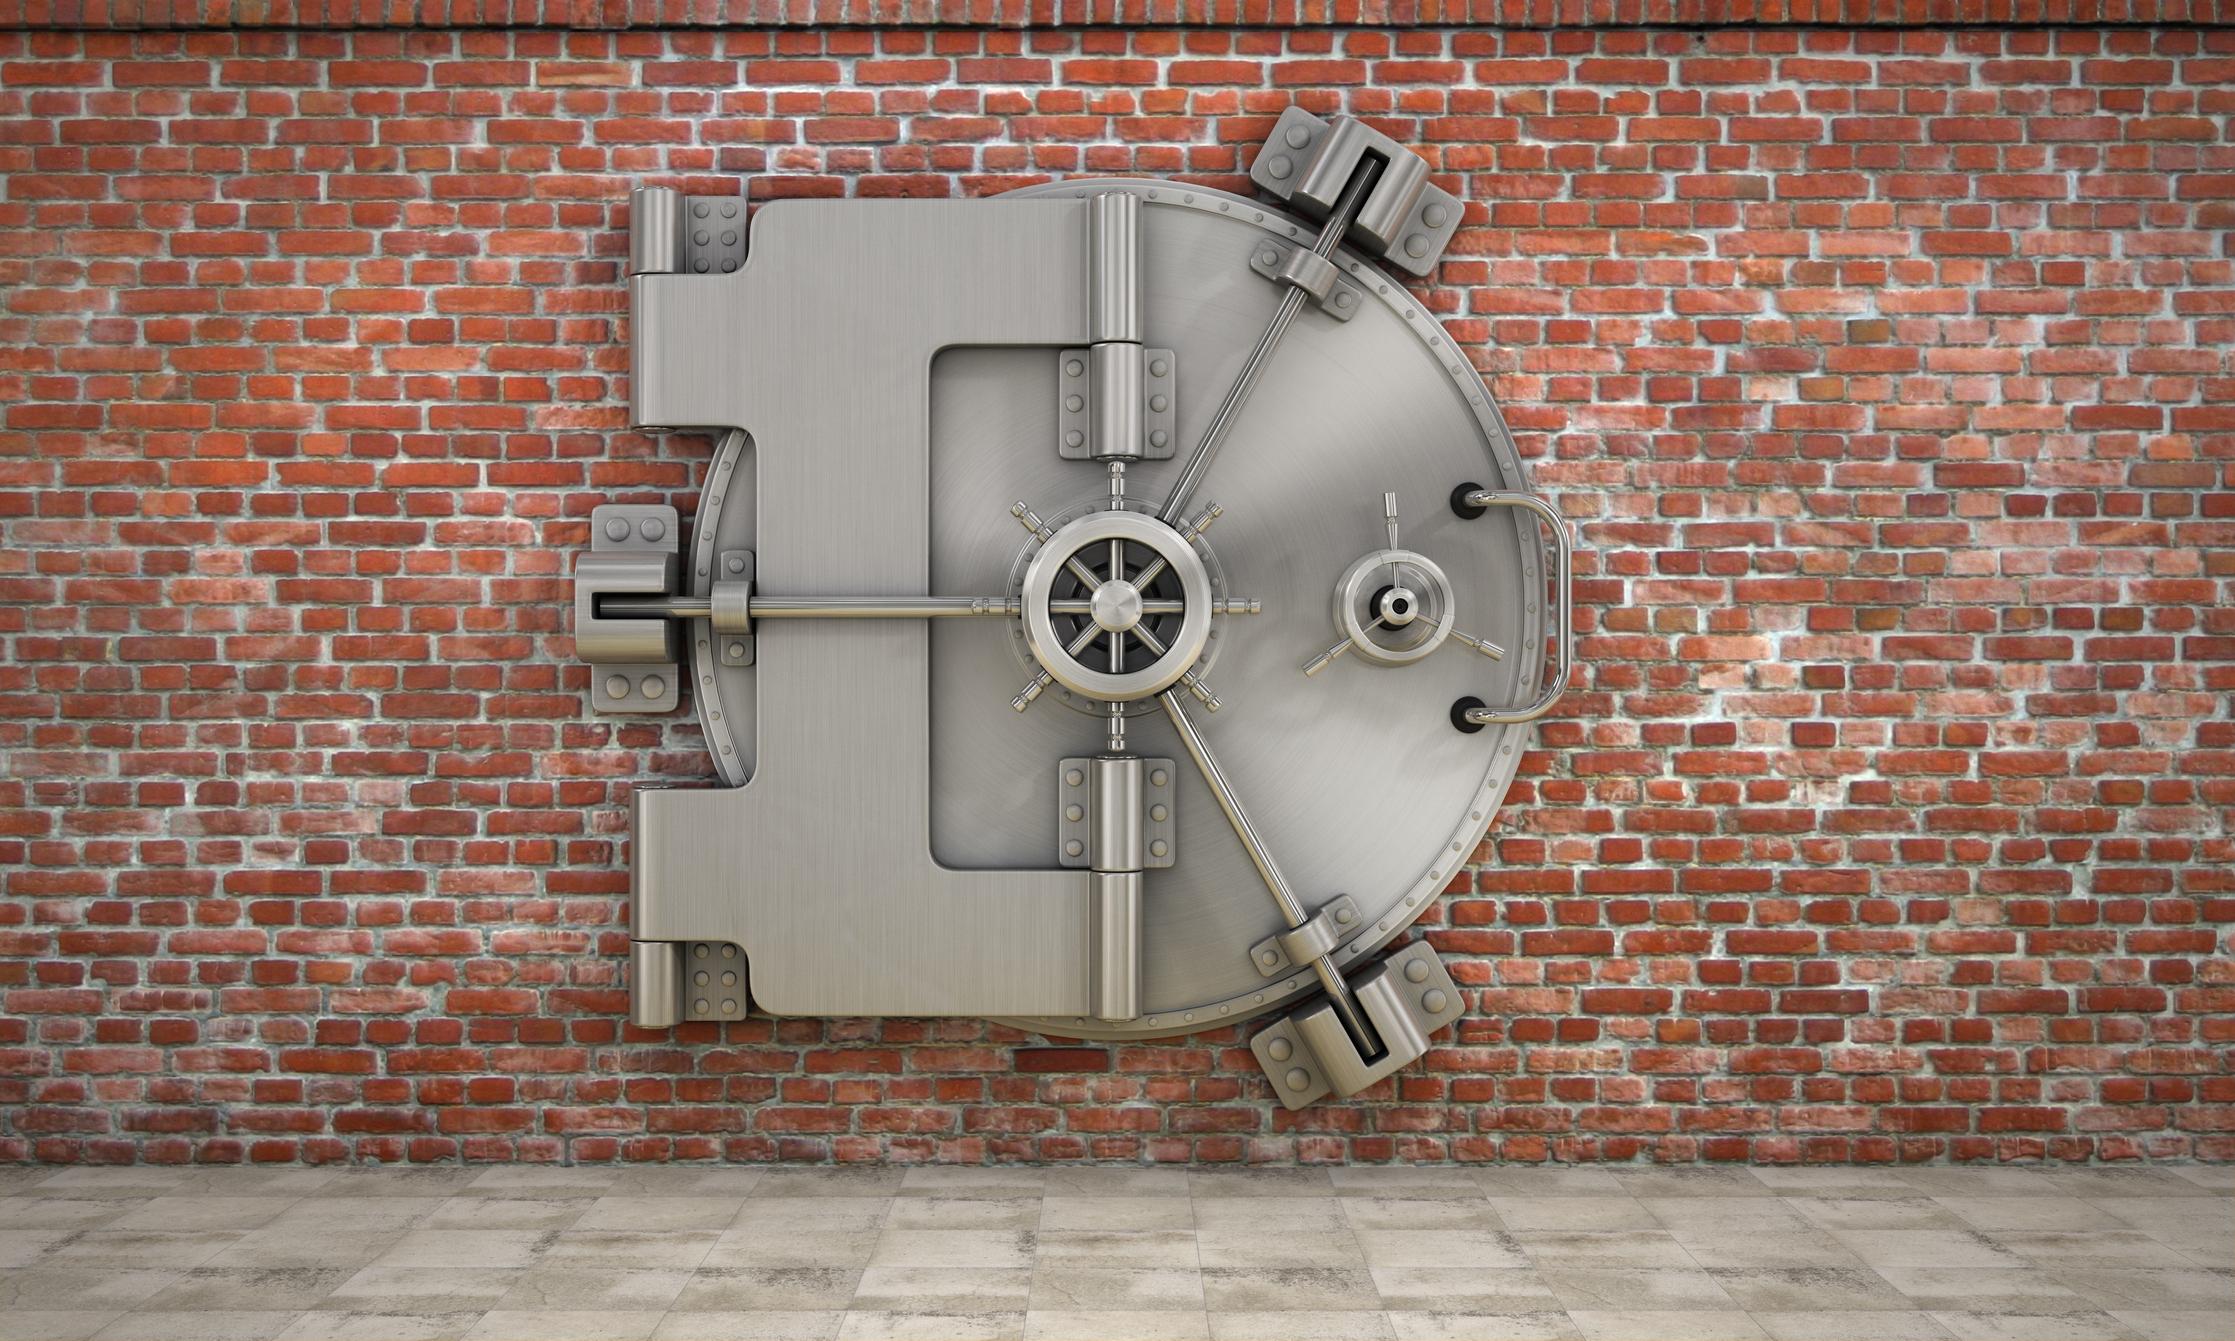 A bank vault against a brick wall.